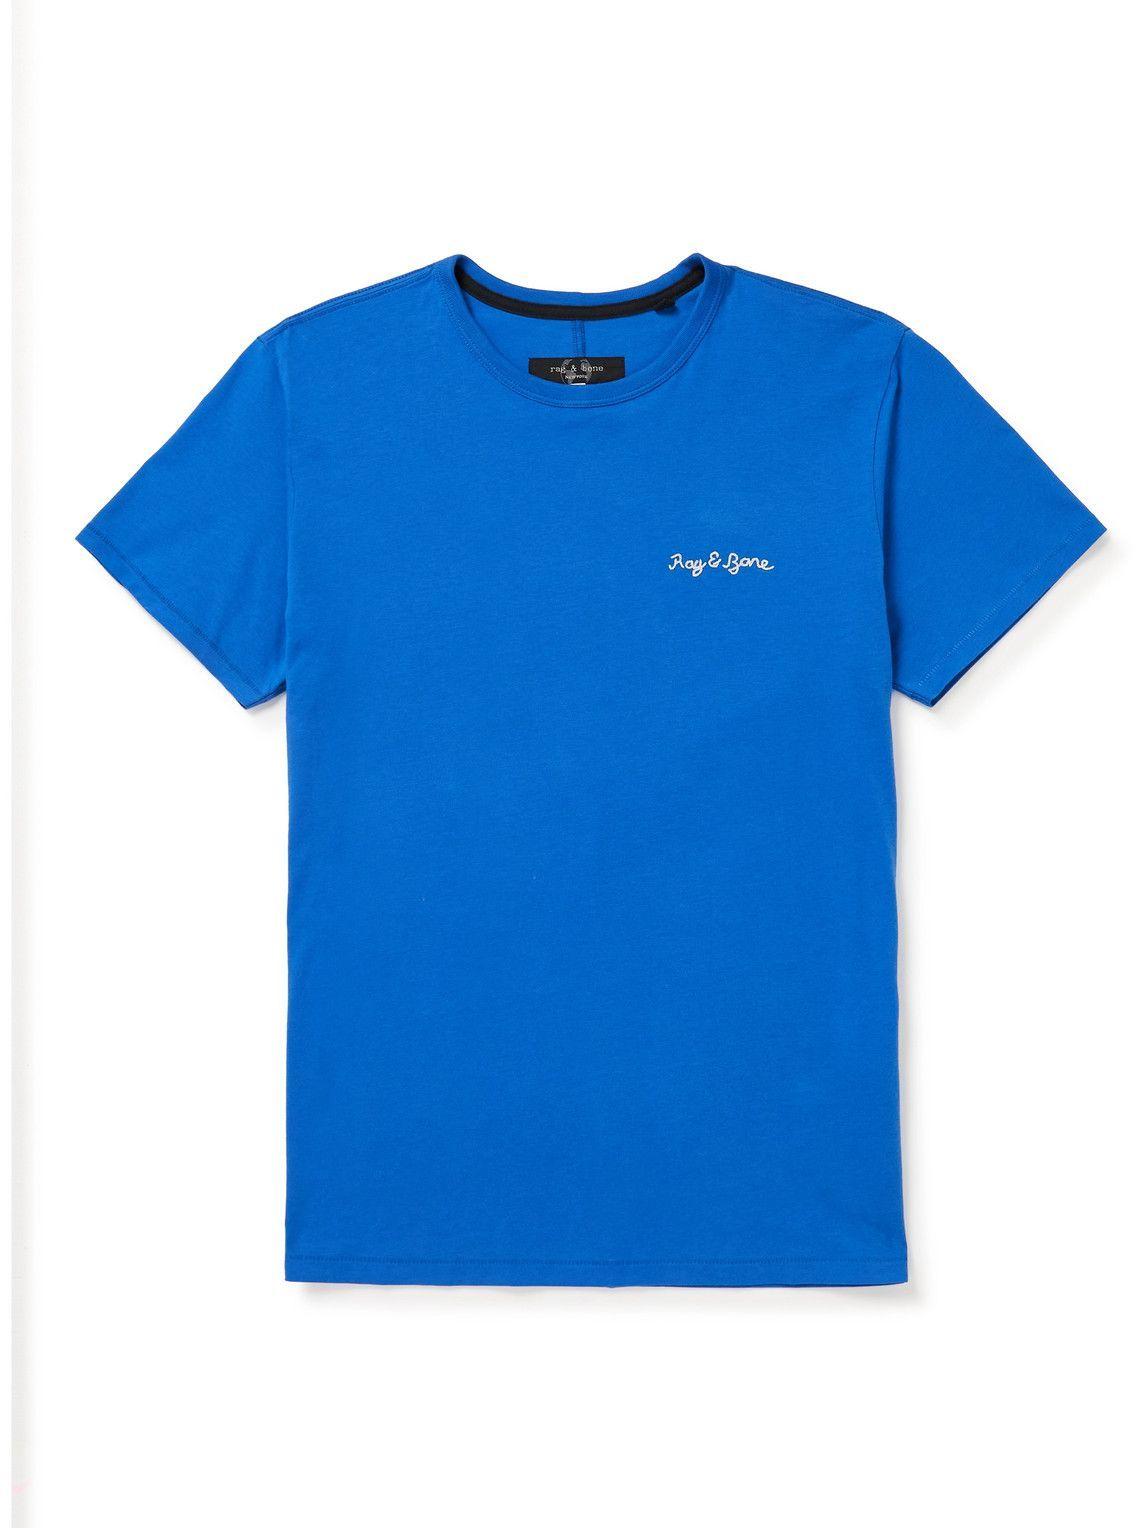 Photo: Rag & Bone - Principle Logo-Embroidered Organic Cotton-Jersey T-Shirt - Blue